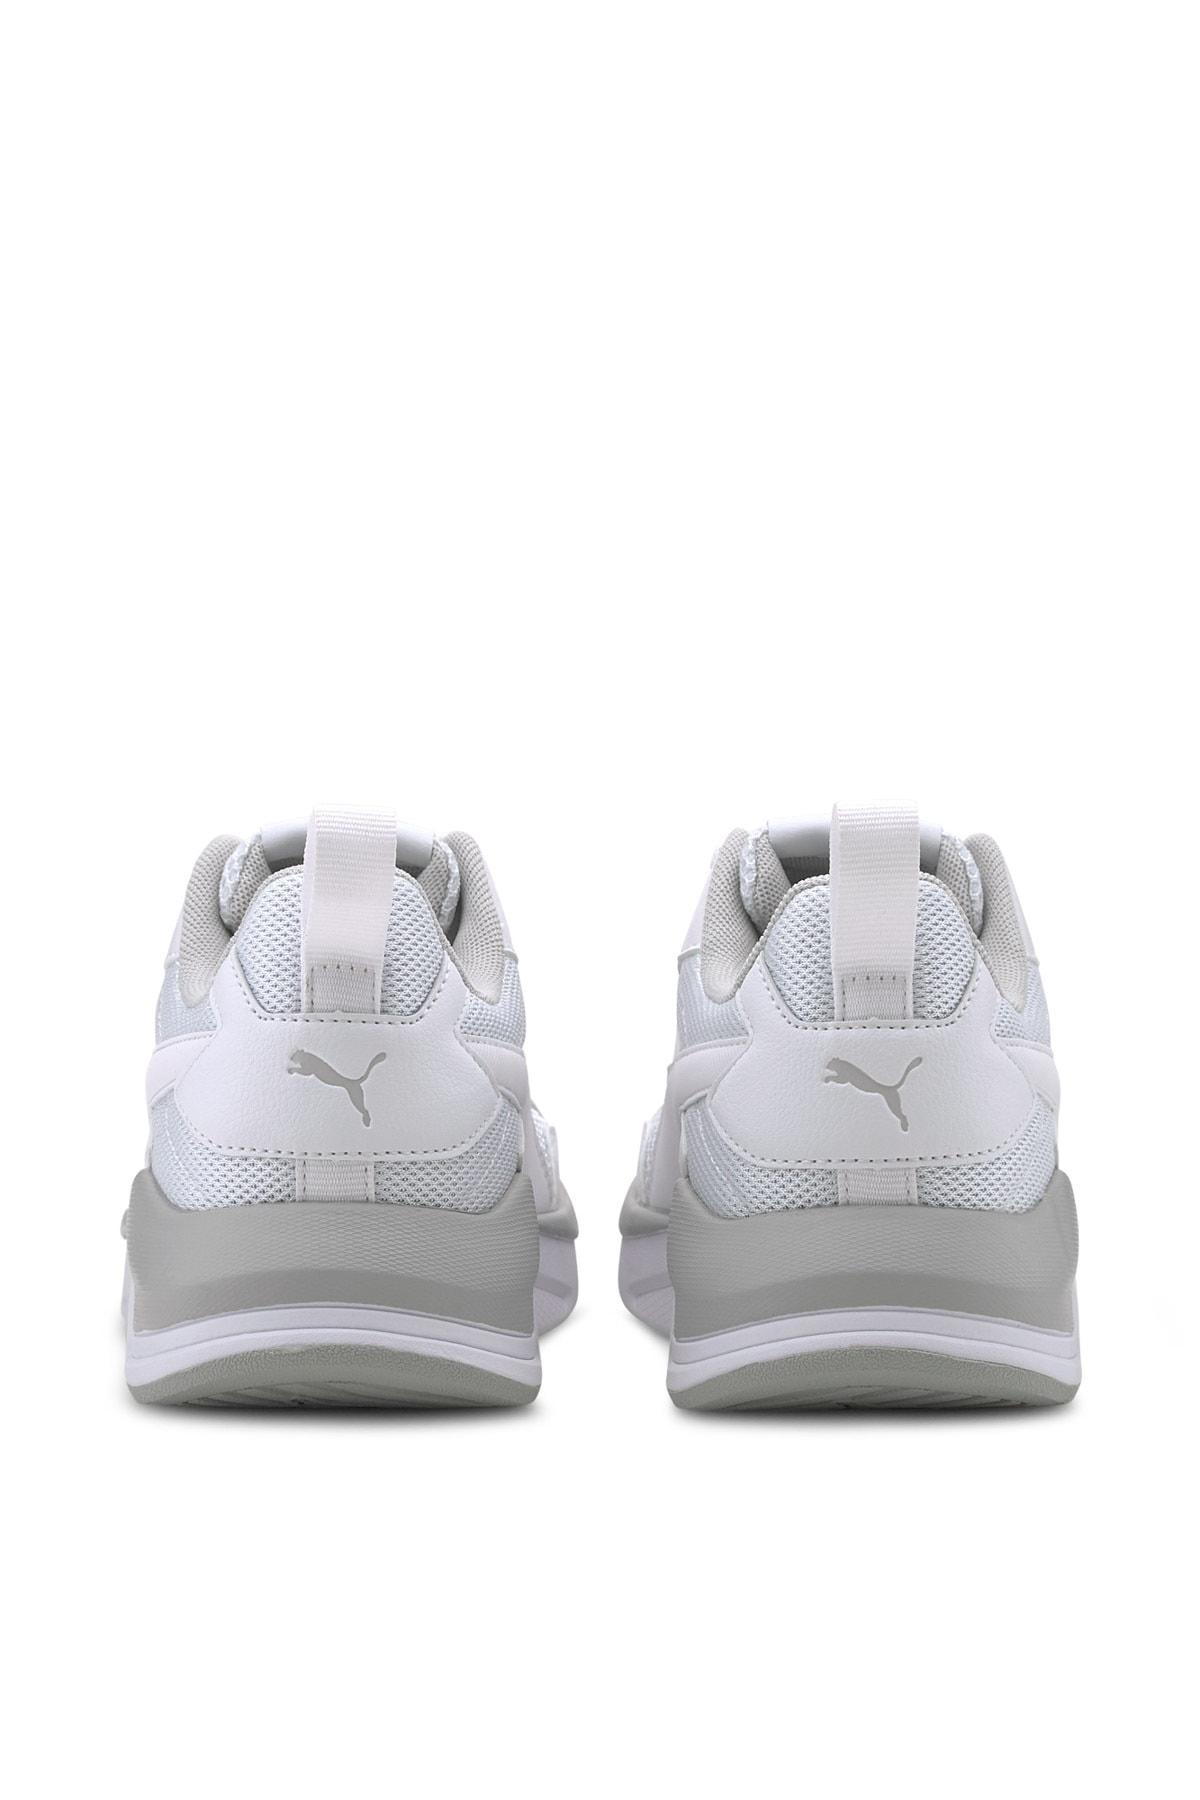 Puma X-RAY LITE JR Beyaz Kız Çocuk Sneaker Ayakkabı 100660673 2